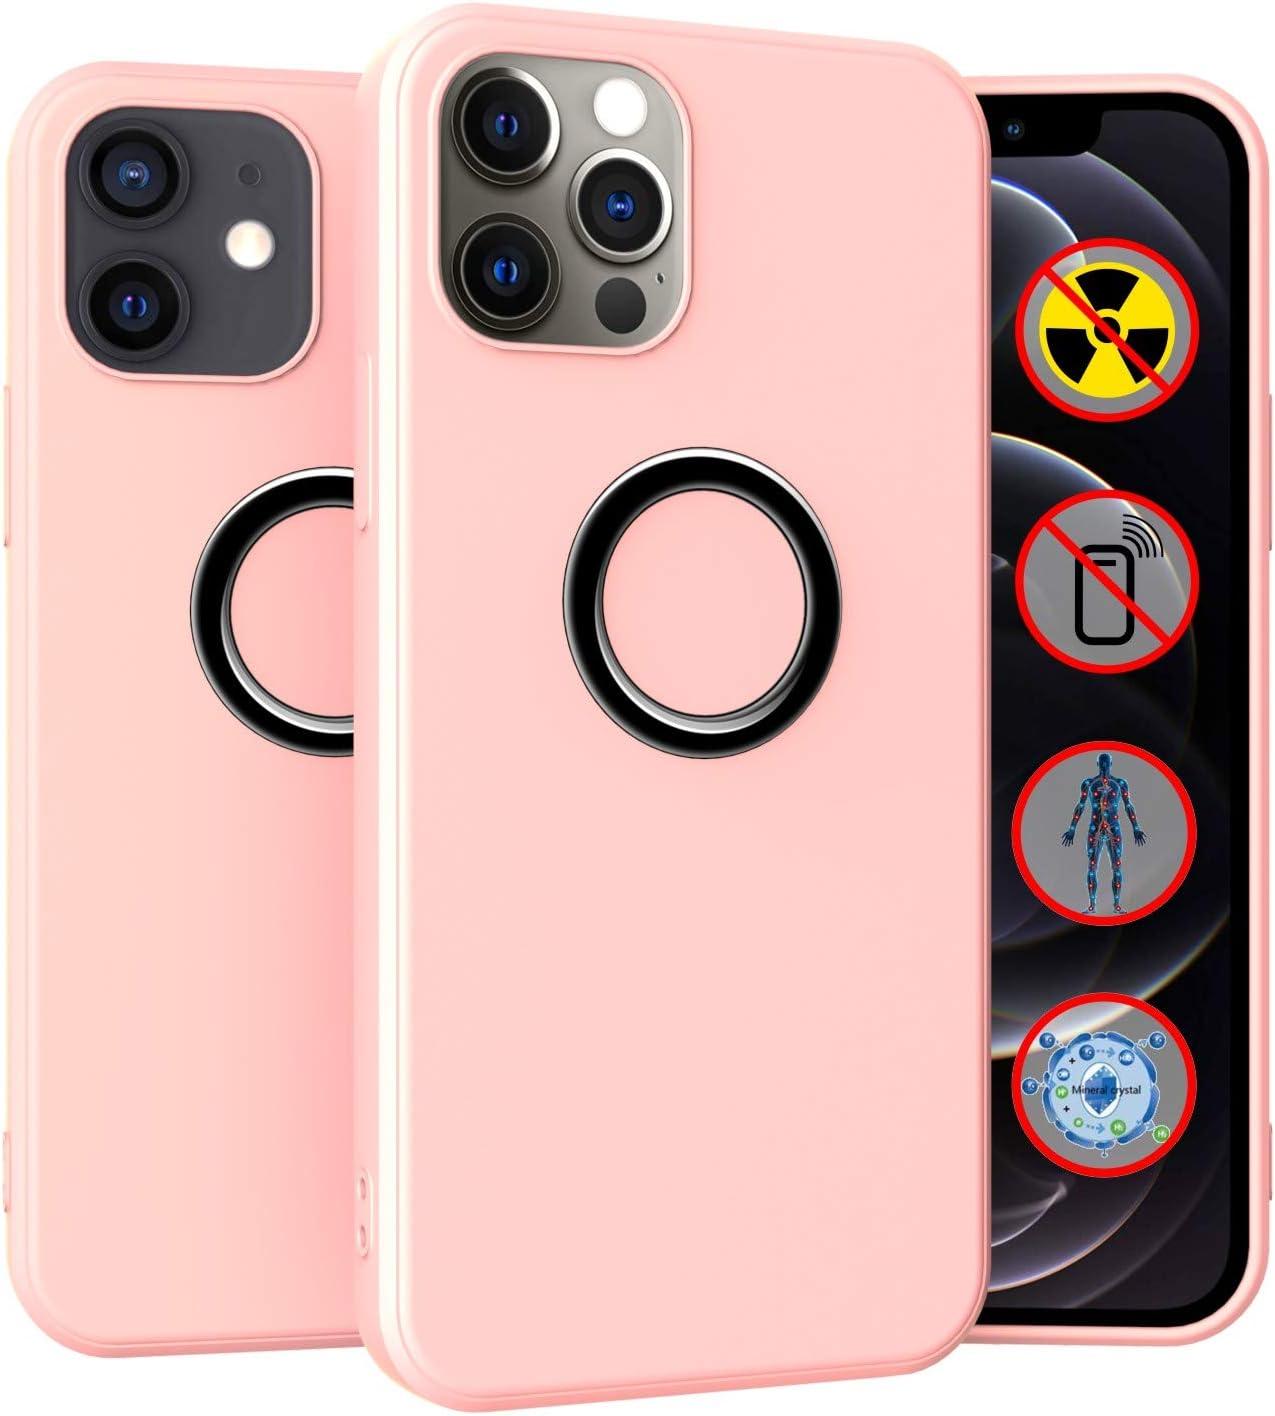 Tamiia gift Designed for iPhone Popular brand Case C Pro 12